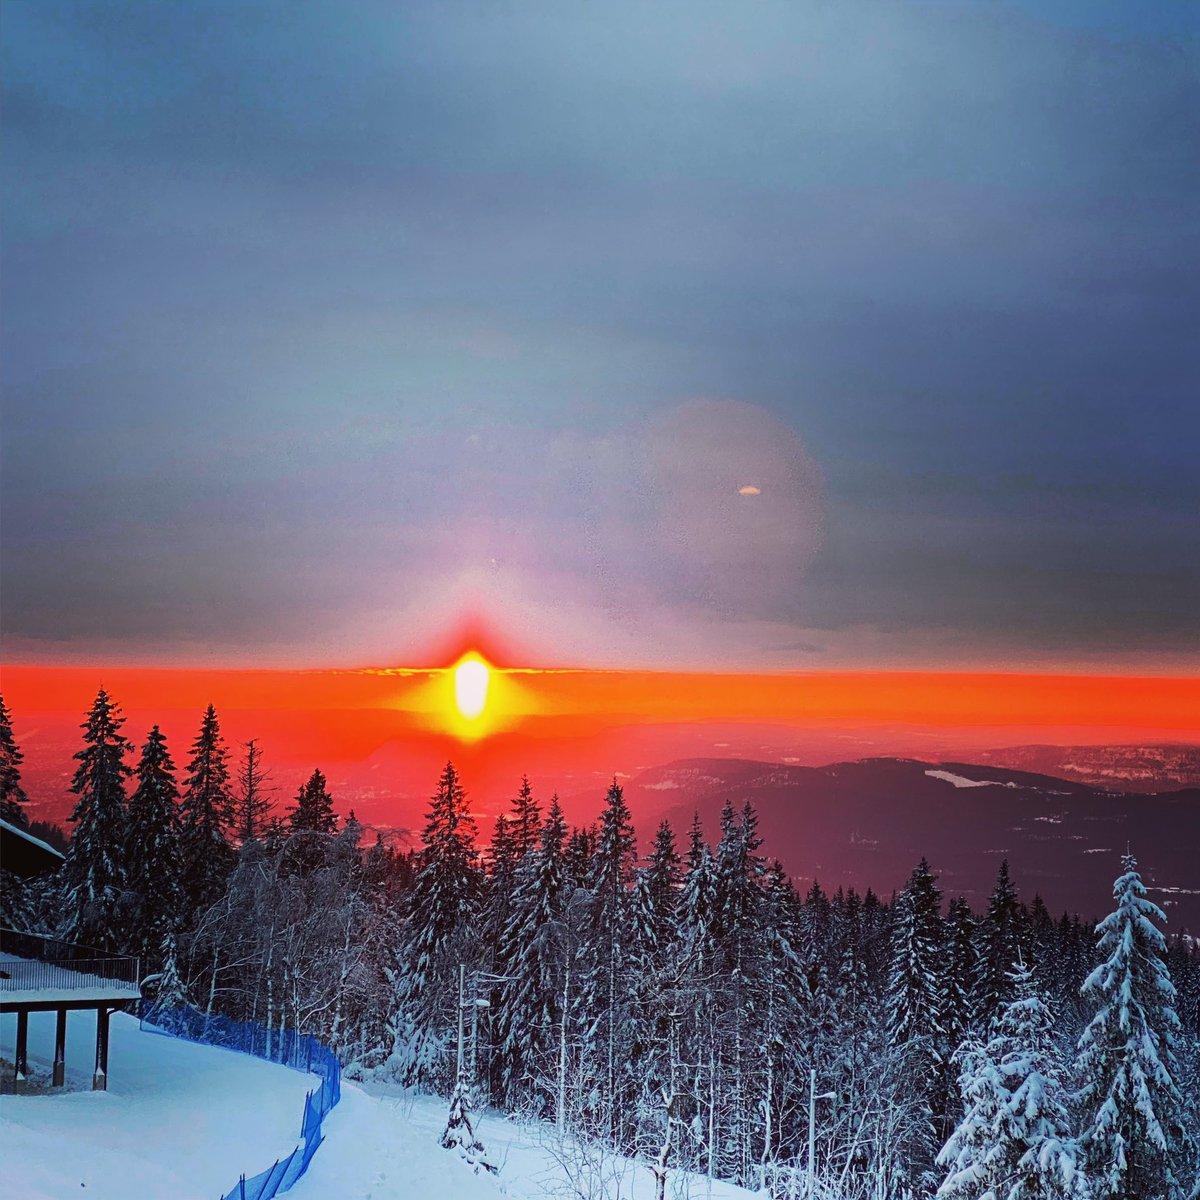 The sky above Oslo #sky #oslo #woods #dawn #zalazaksunca #zalazak_sunca #sunset #sungoingdown #nature #winter #travel #amazing #redsky #redskyatnight #redskyatmorning #redskyatnightsailorsdelight #redskyperformance #redskyline